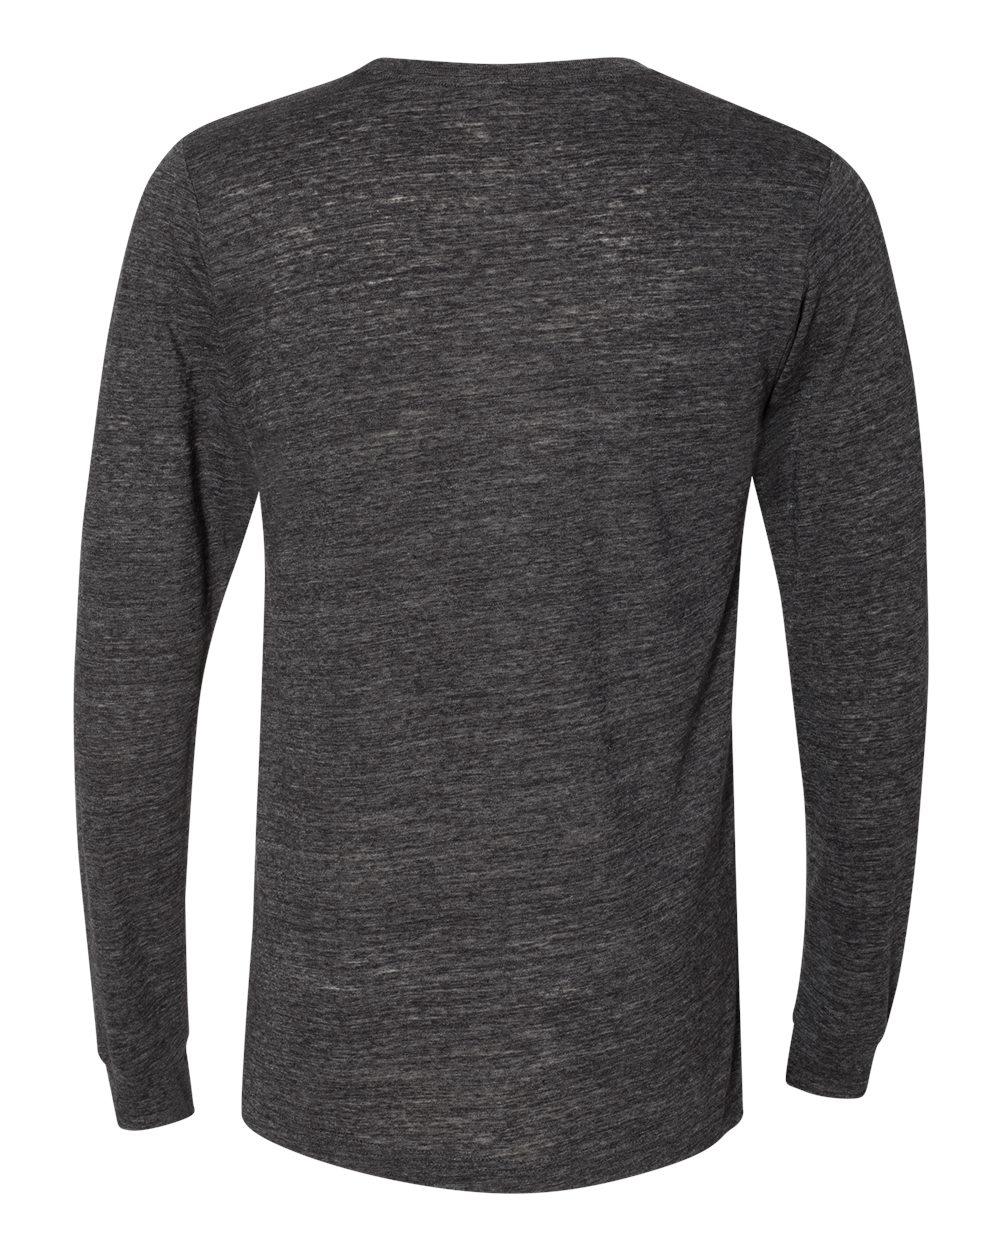 Bella-Canvas-Mens-Blank-Top-Long-Sleeve-Jersey-Tee-T-Shirt-3501-up-to-3XL thumbnail 31